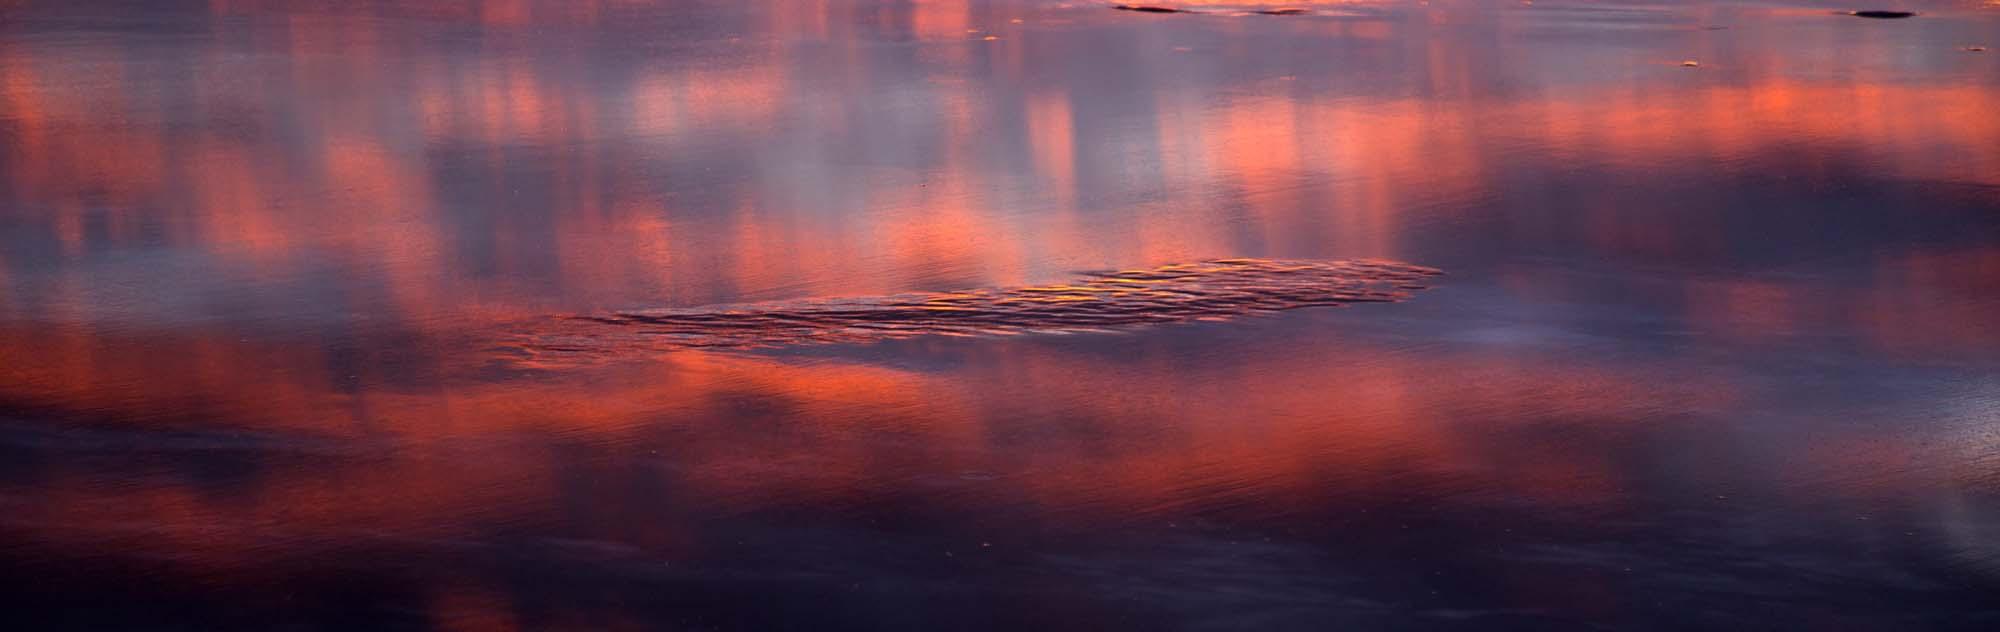 evening reflecions